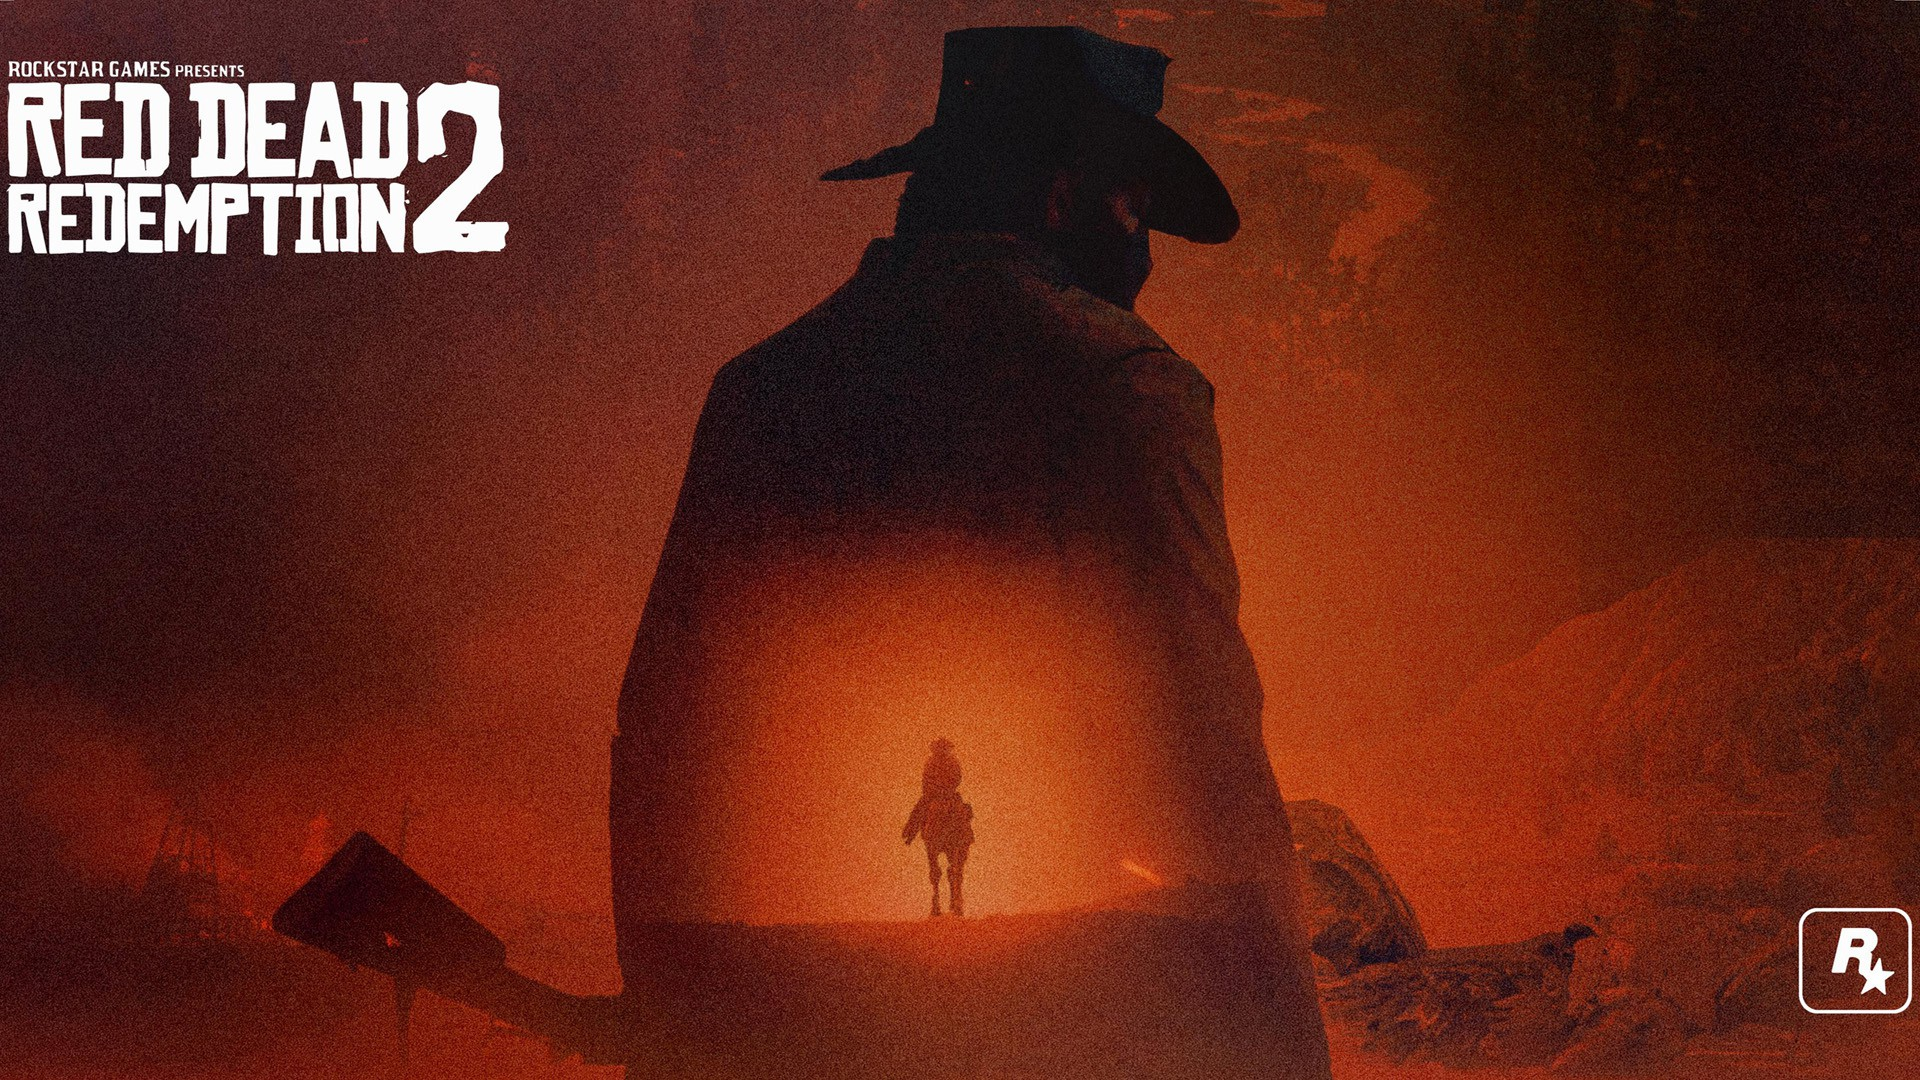 Free Download Red Dead Redemption 2 Ps4 Hd Desktop Wallpapers Flip